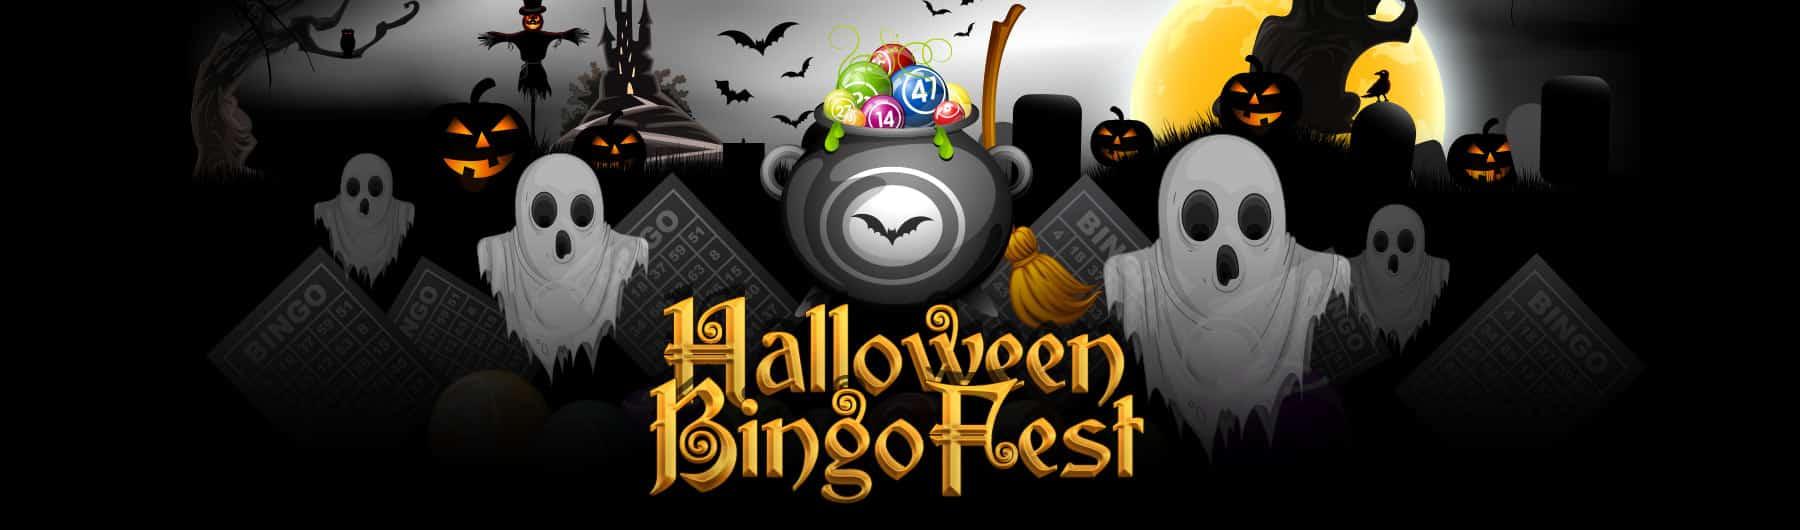 Vics Bingo Halloween Bingo Promotion